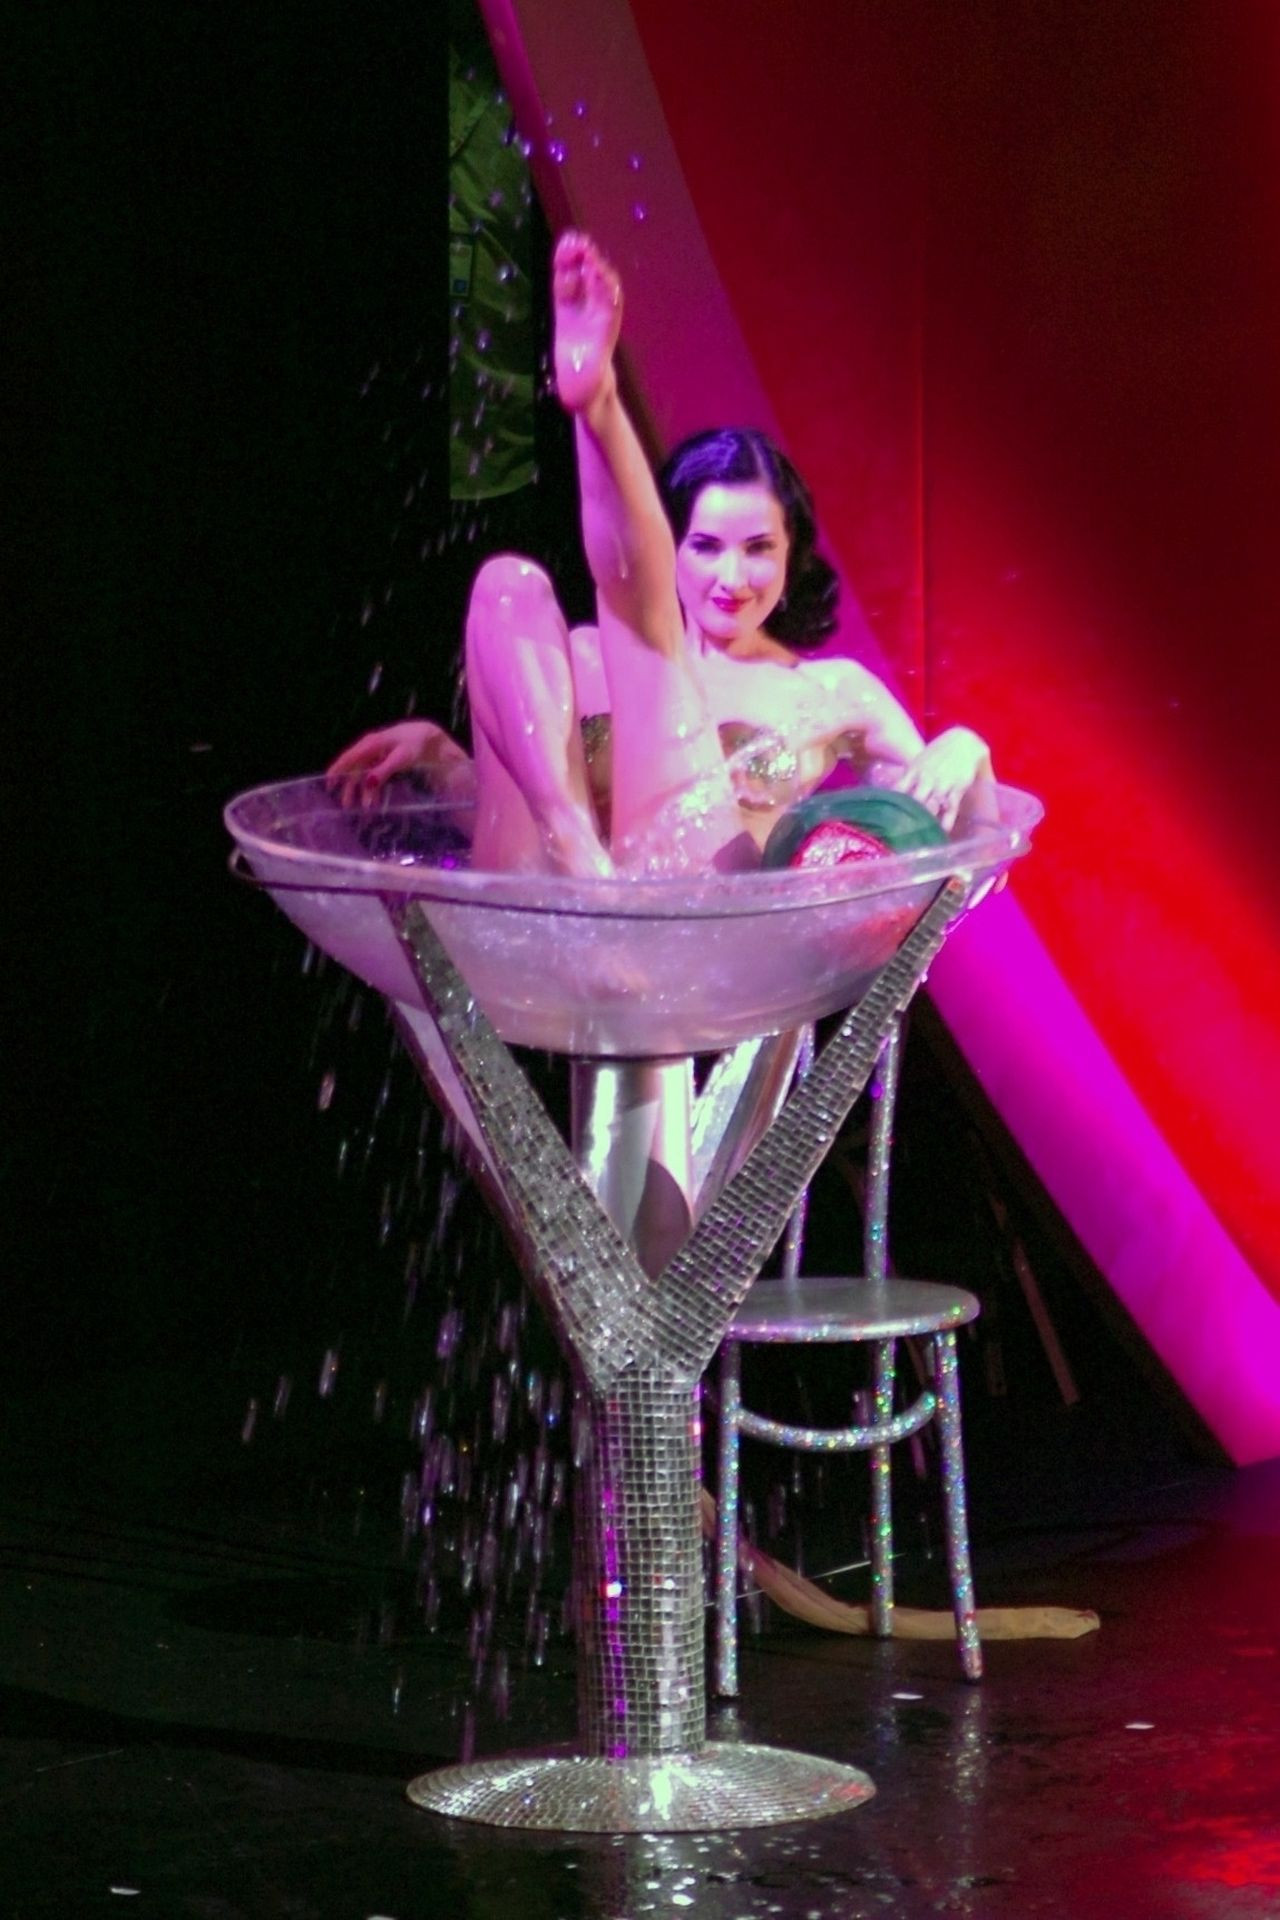 Dita Von Teese Performs At Erotica 06 In London 0039